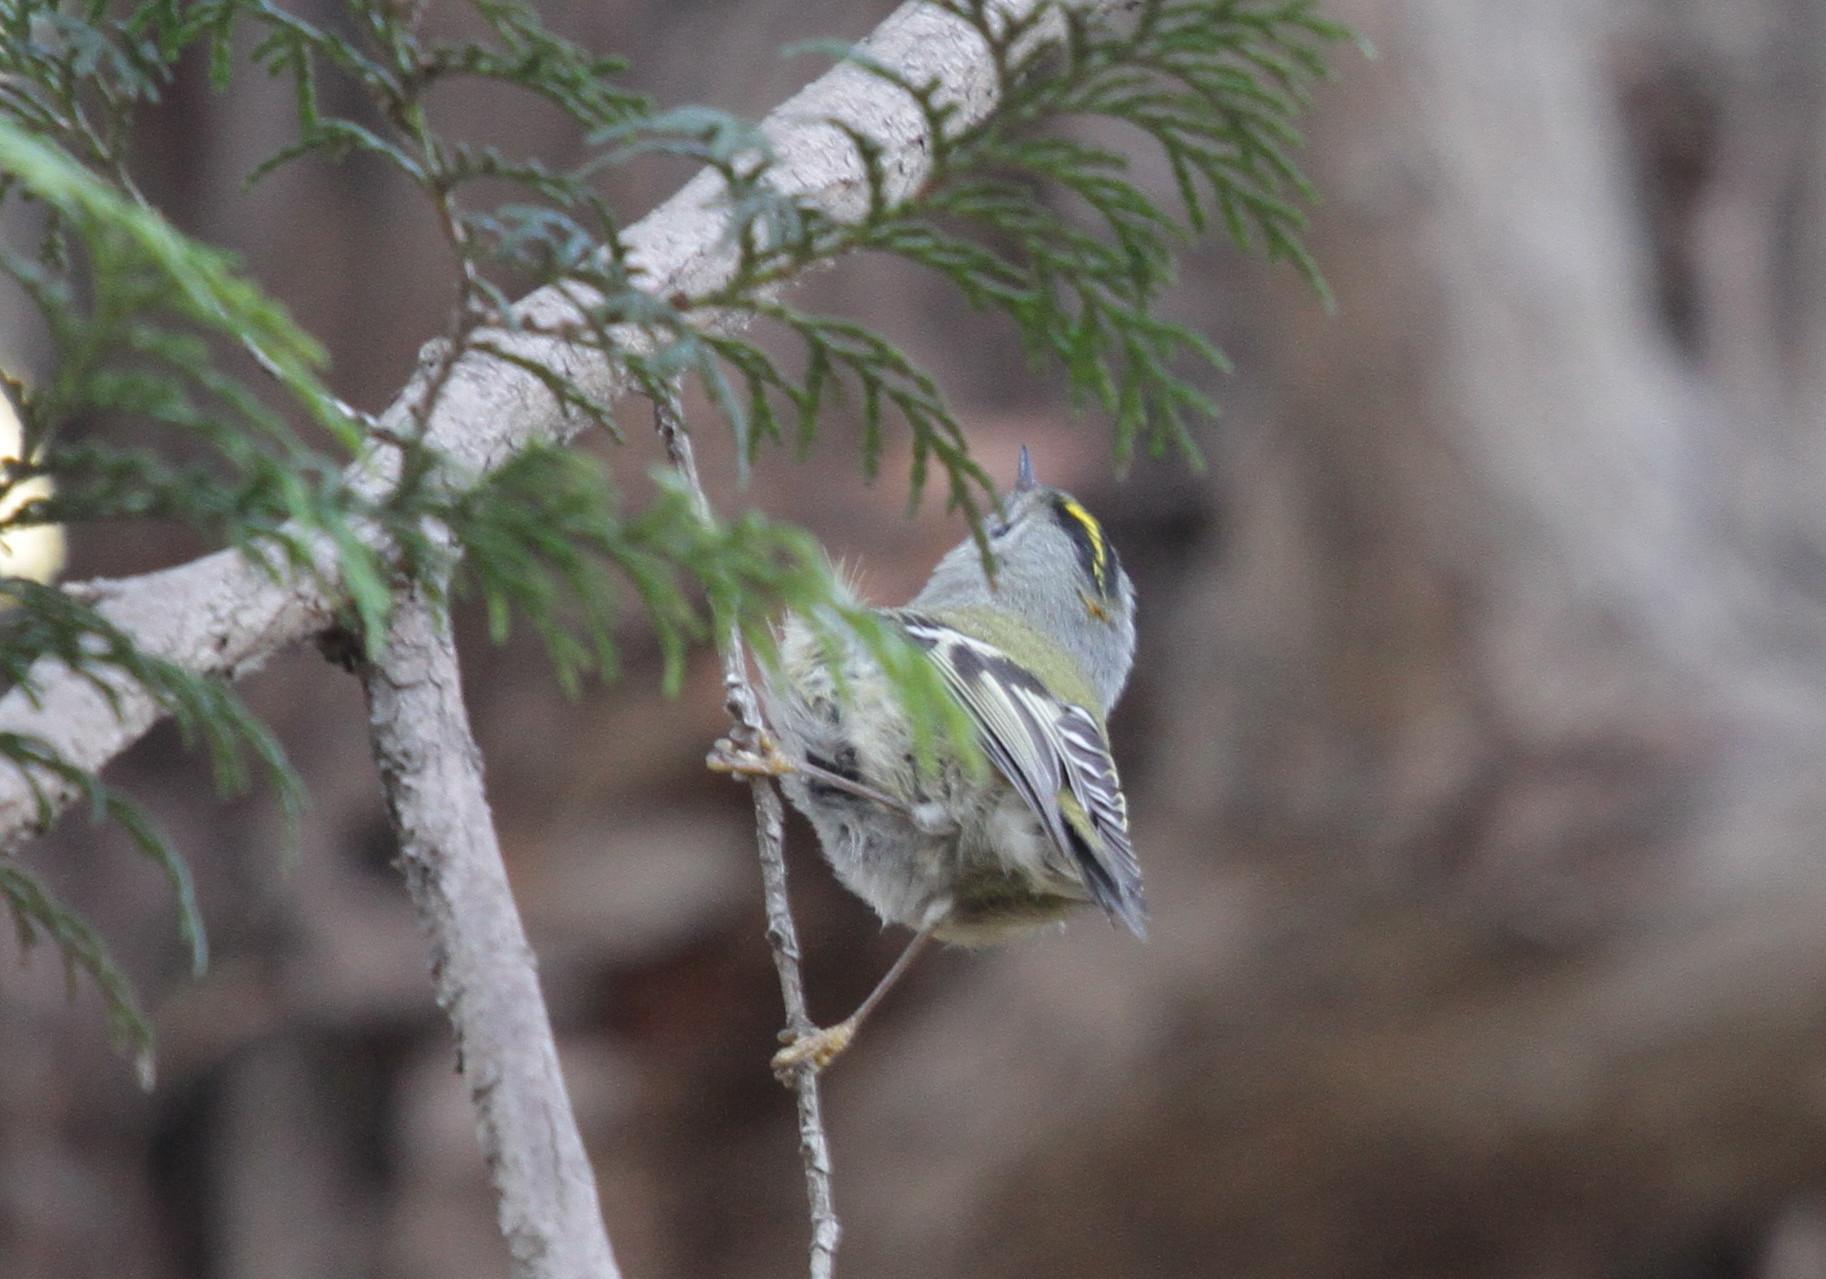 MFを鳥撮り散歩_f0239515_21264142.jpg